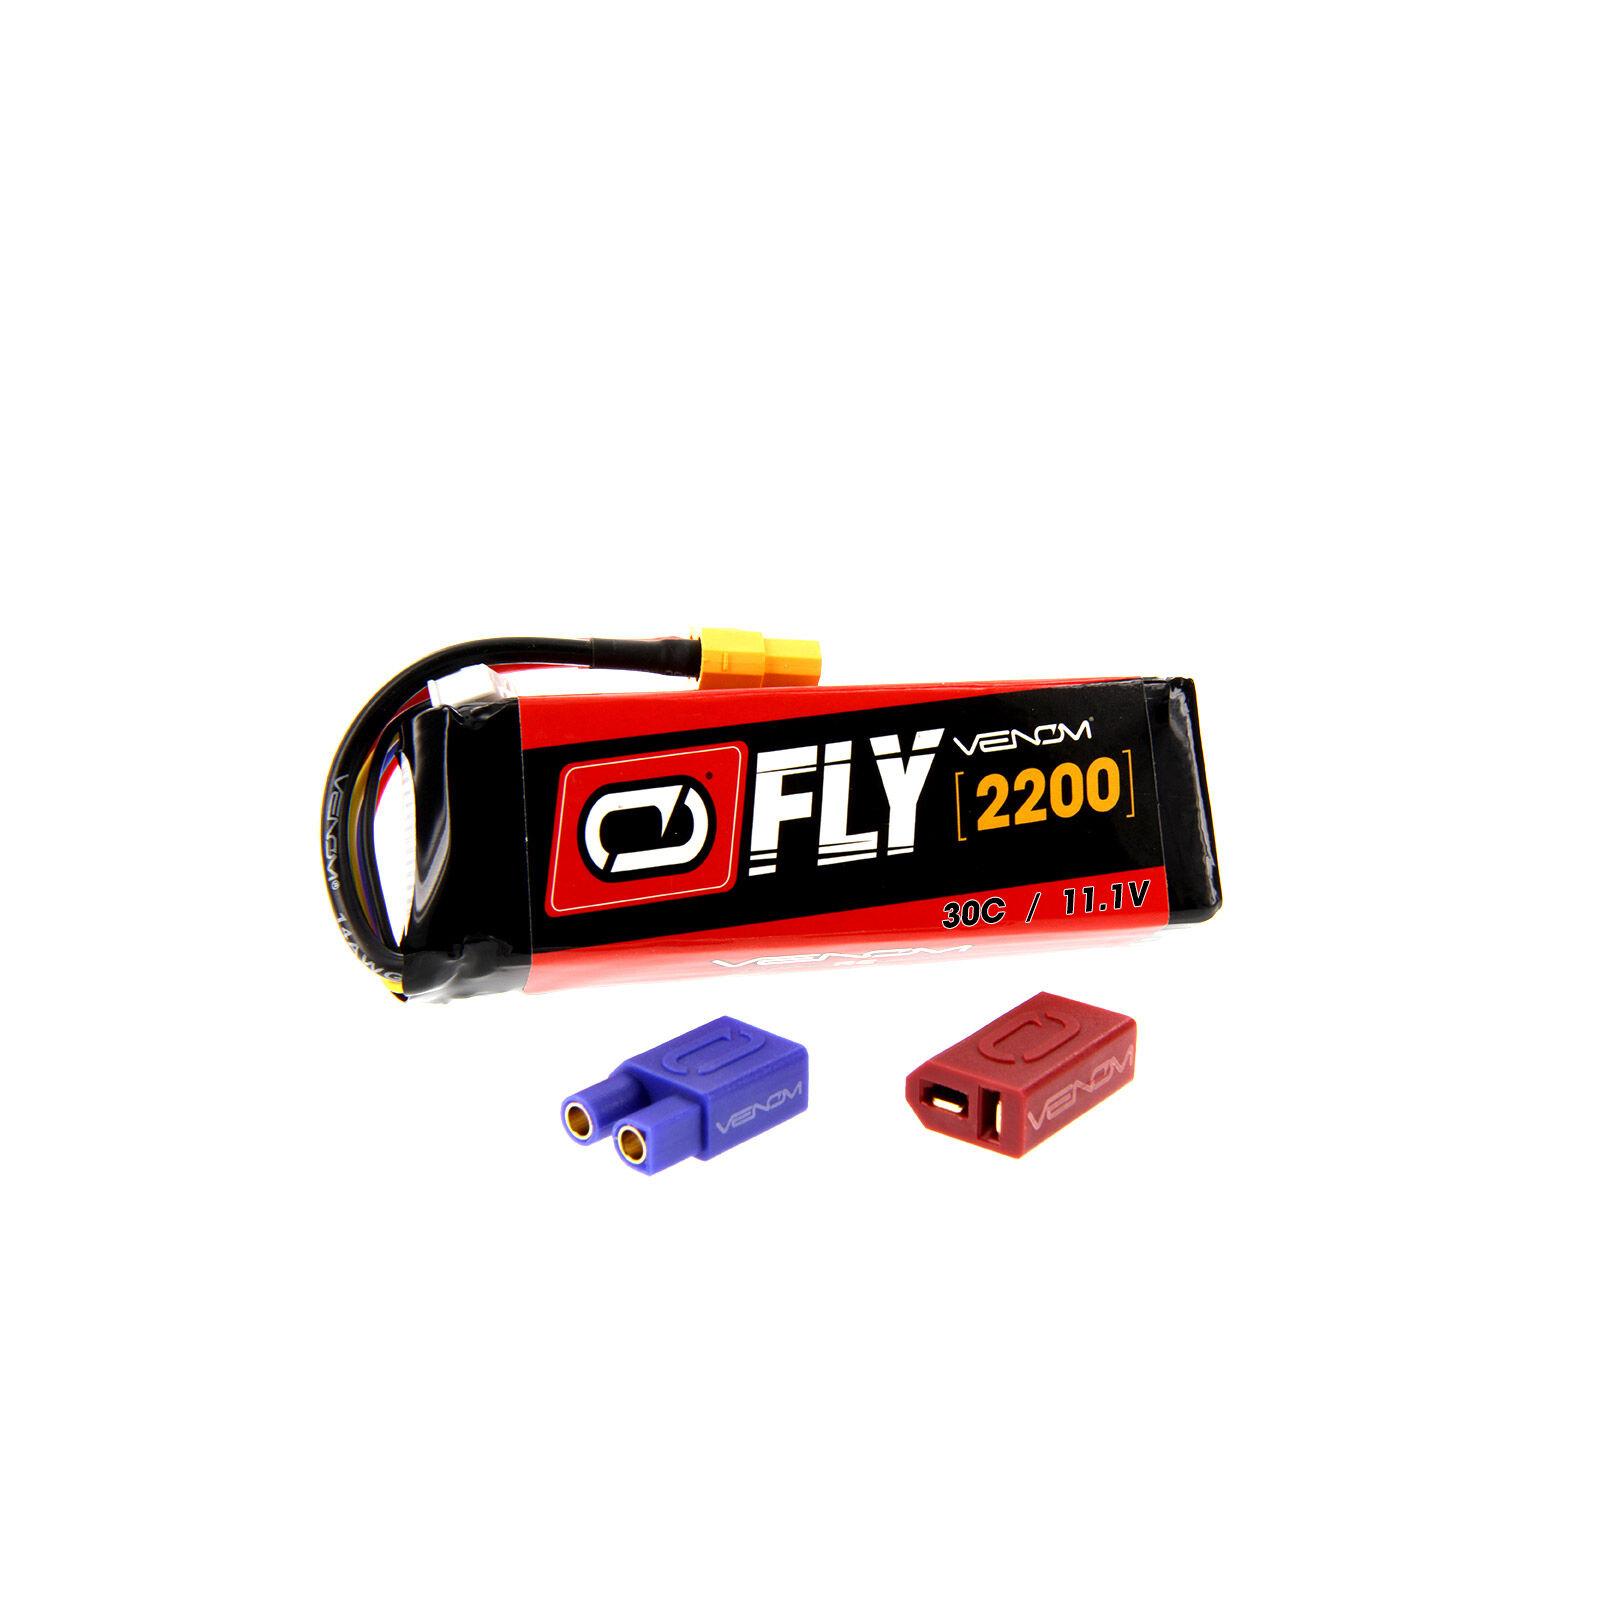 11.1V 2200mAh 3S 30C FLY LiPo Battery: UNI 2.0 Plug